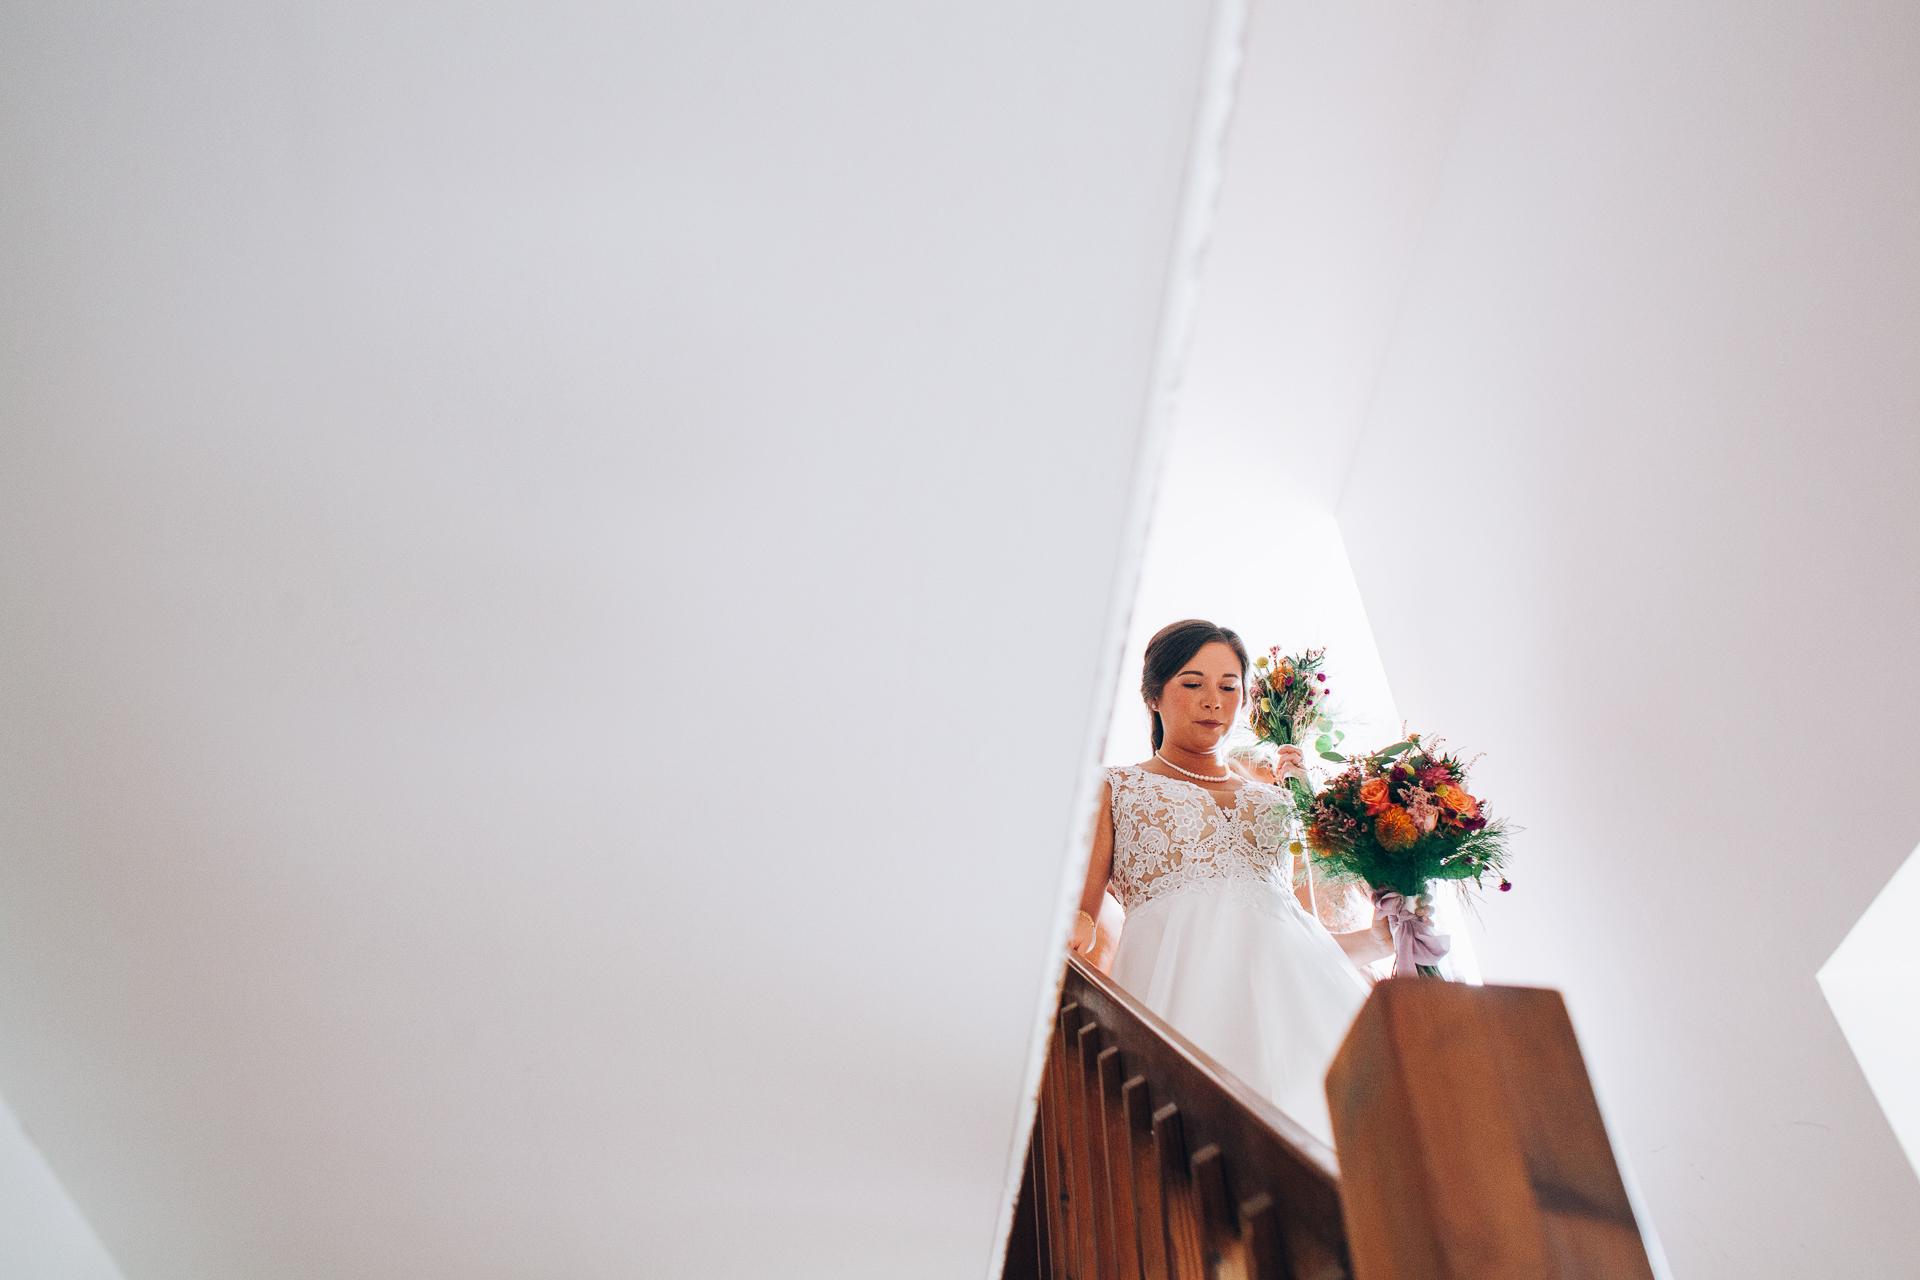 Somerset-Documentary-Wedding-Photographer-4